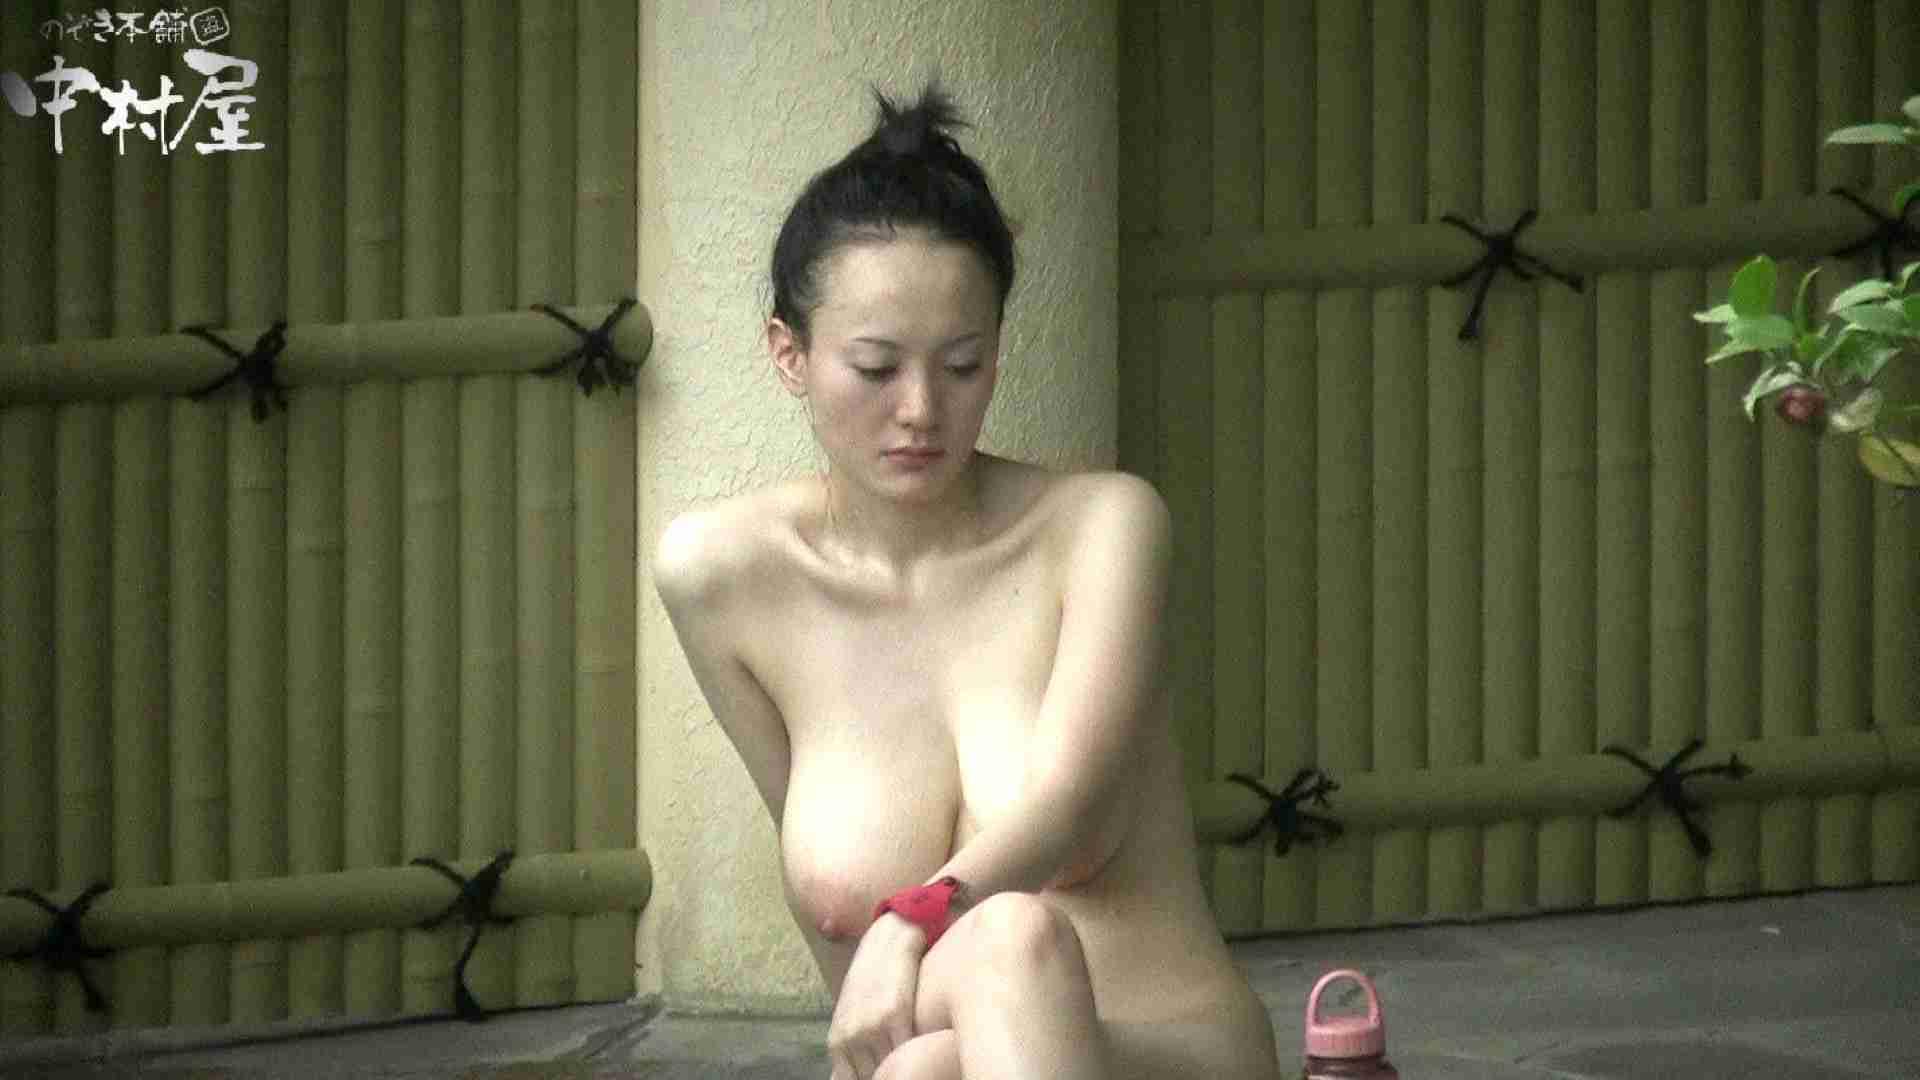 Aquaな露天風呂Vol.903 美しいOLの裸体 オメコ動画キャプチャ 98pic 20